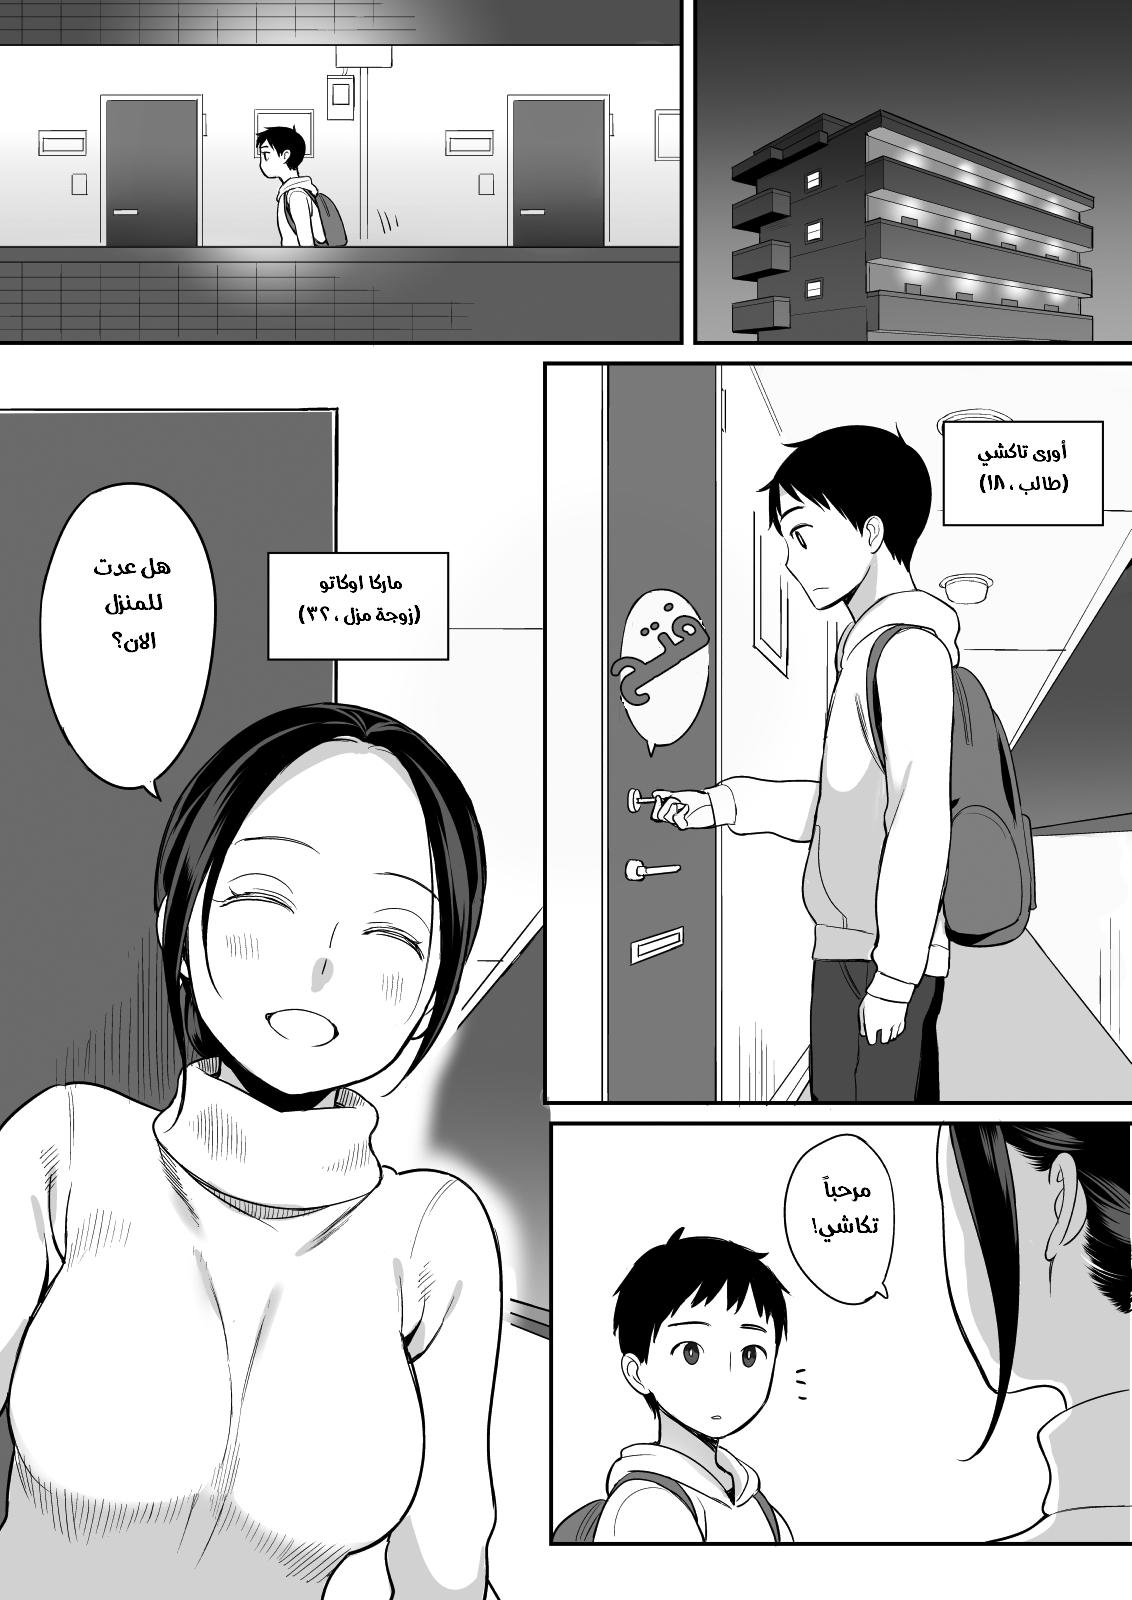 Rinjin ga Succubus | جارتي شيطانة | My Neighbor is a Succubus 2